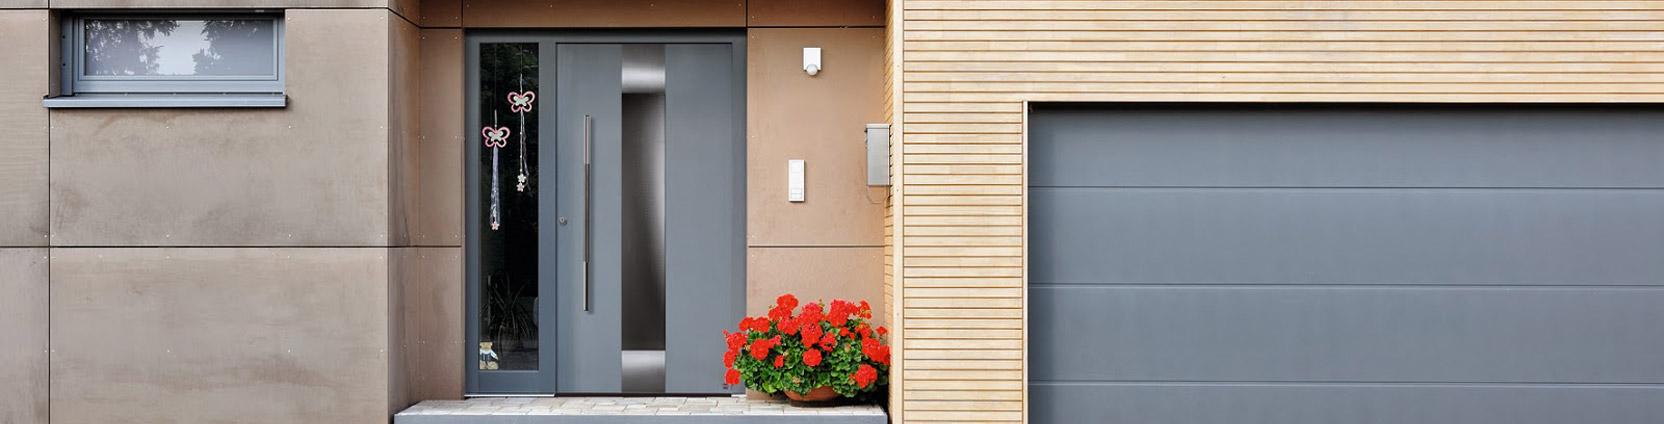 Lite-Style Entrance Doors & Hormann Doors Uk u0026 Picture Showing Matching L-Rib Sectional Garage ... pezcame.com